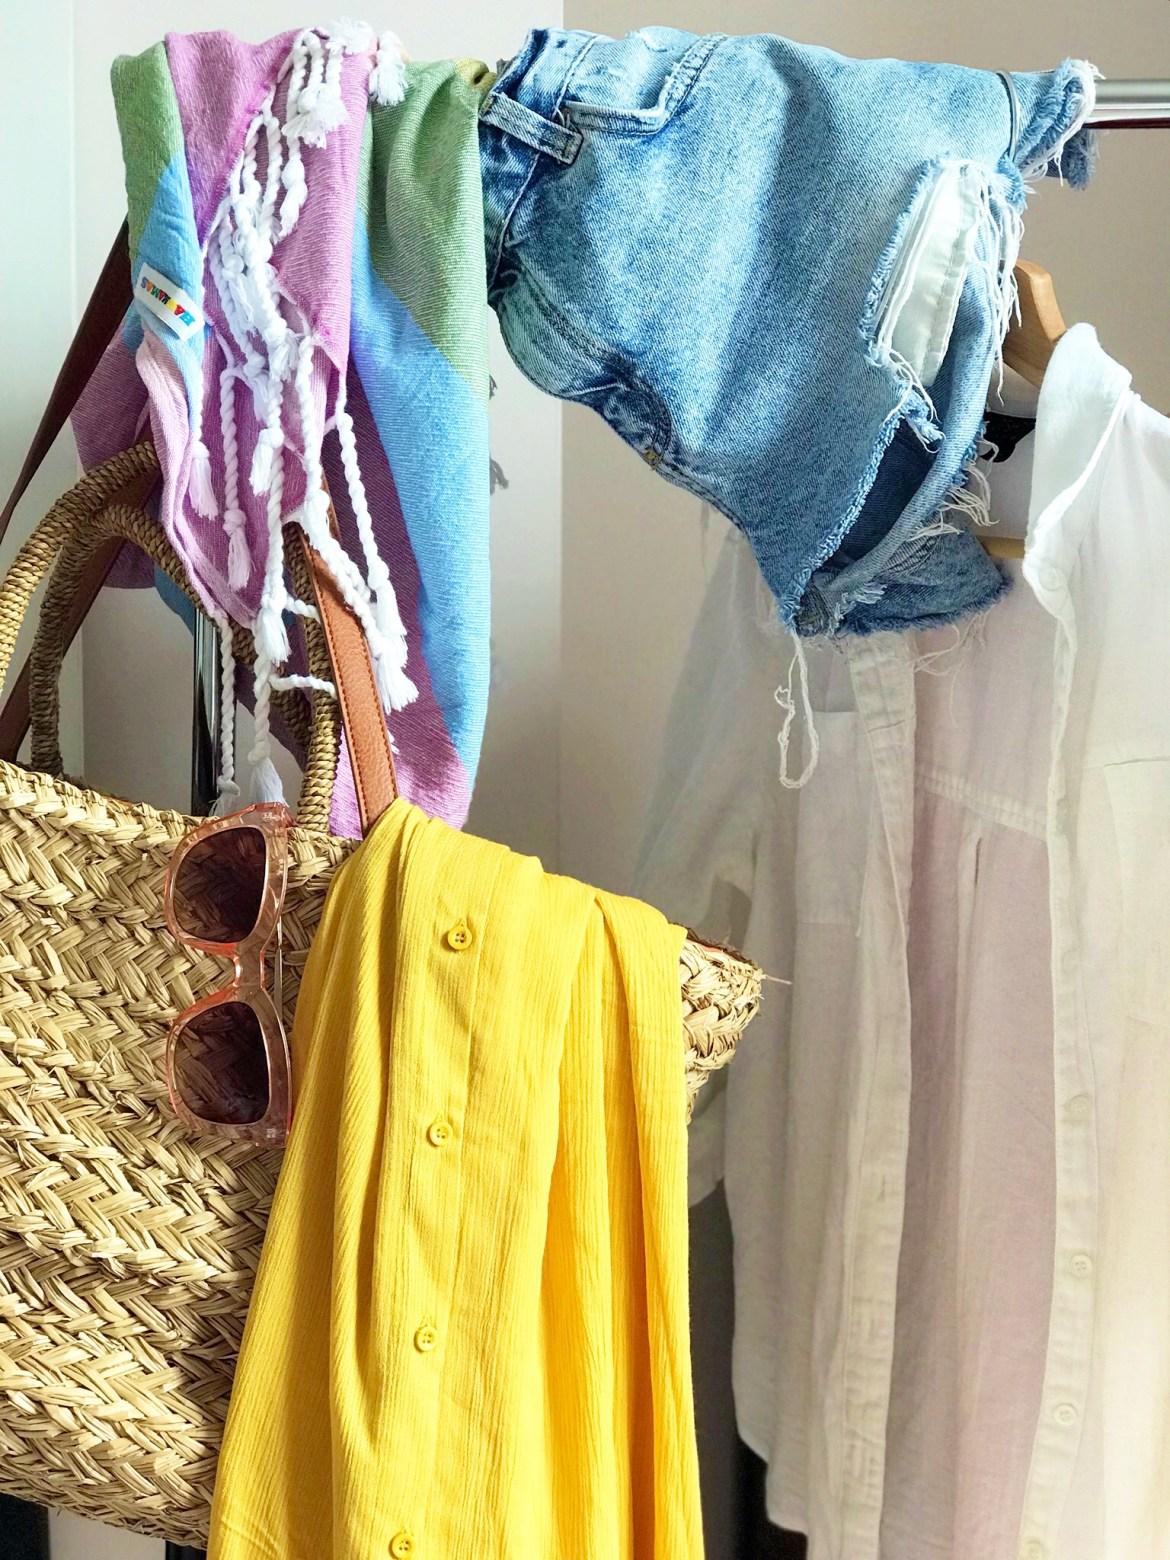 My summer holiday wardrobe...